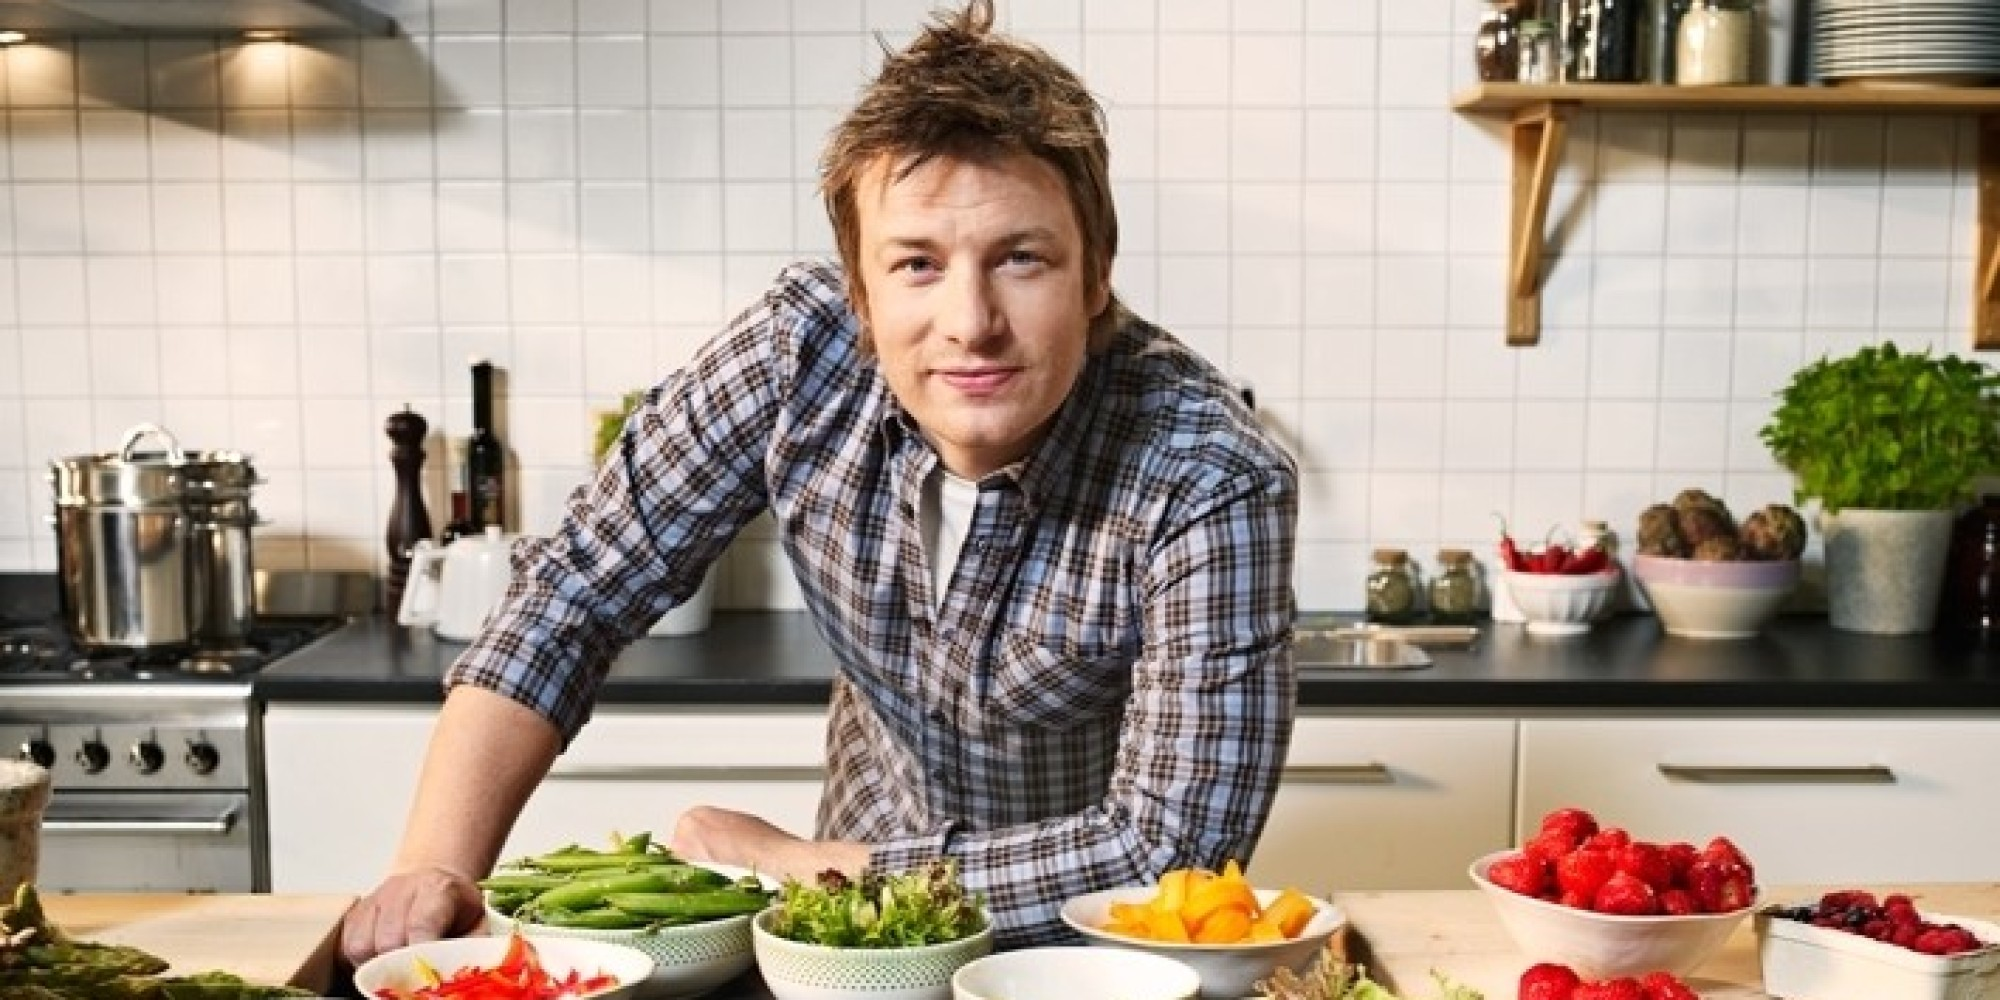 Jamie Oliver - Biography